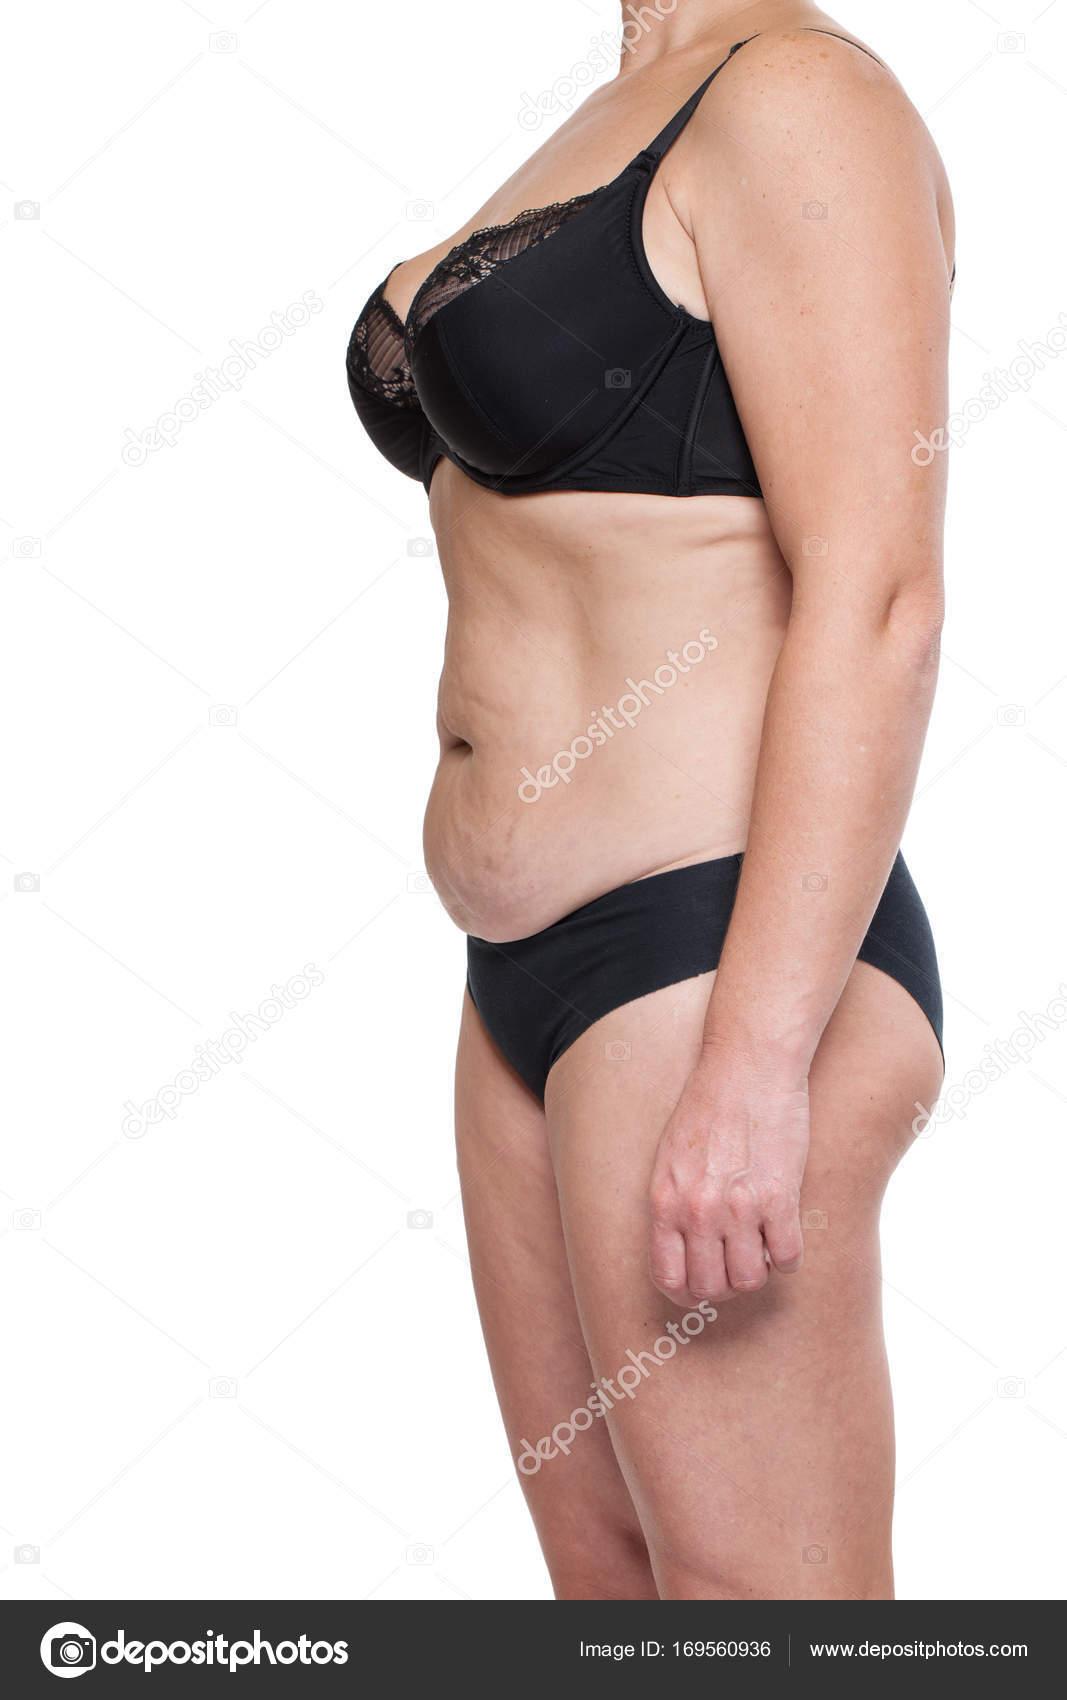 Jennifer sloane oral sex